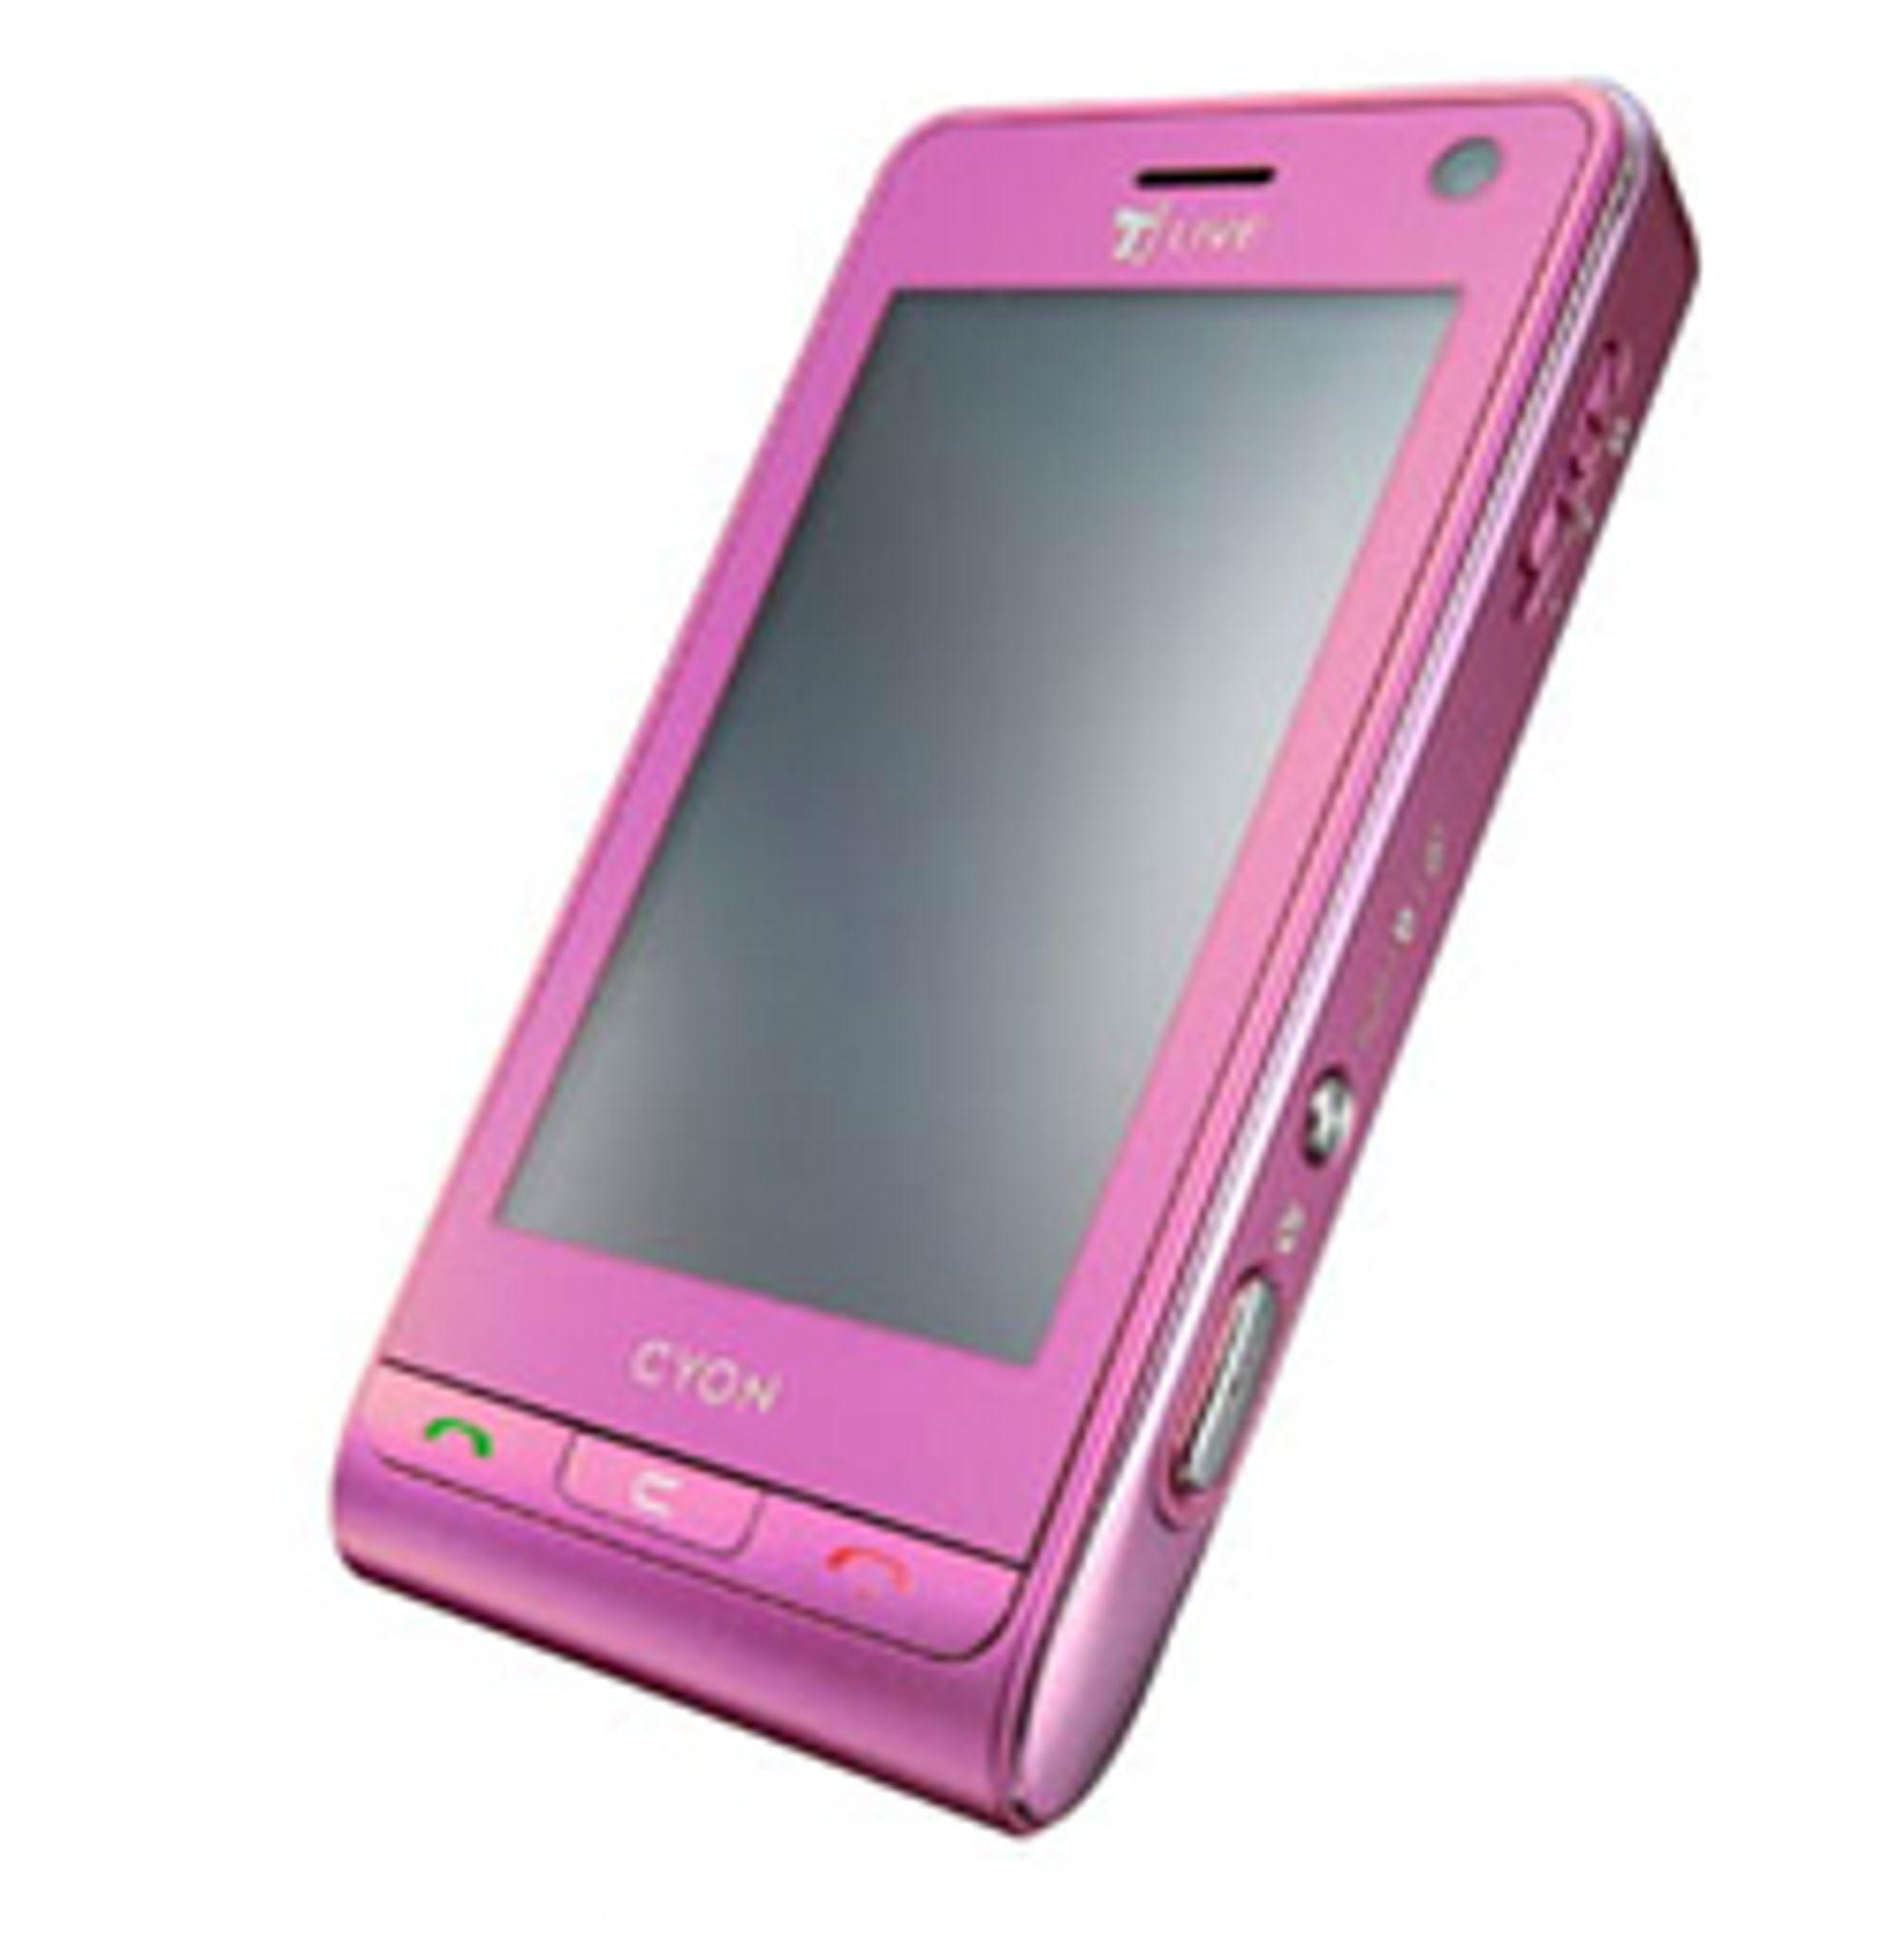 Nå kommer LGs suksessmodell KU990 i rosa.